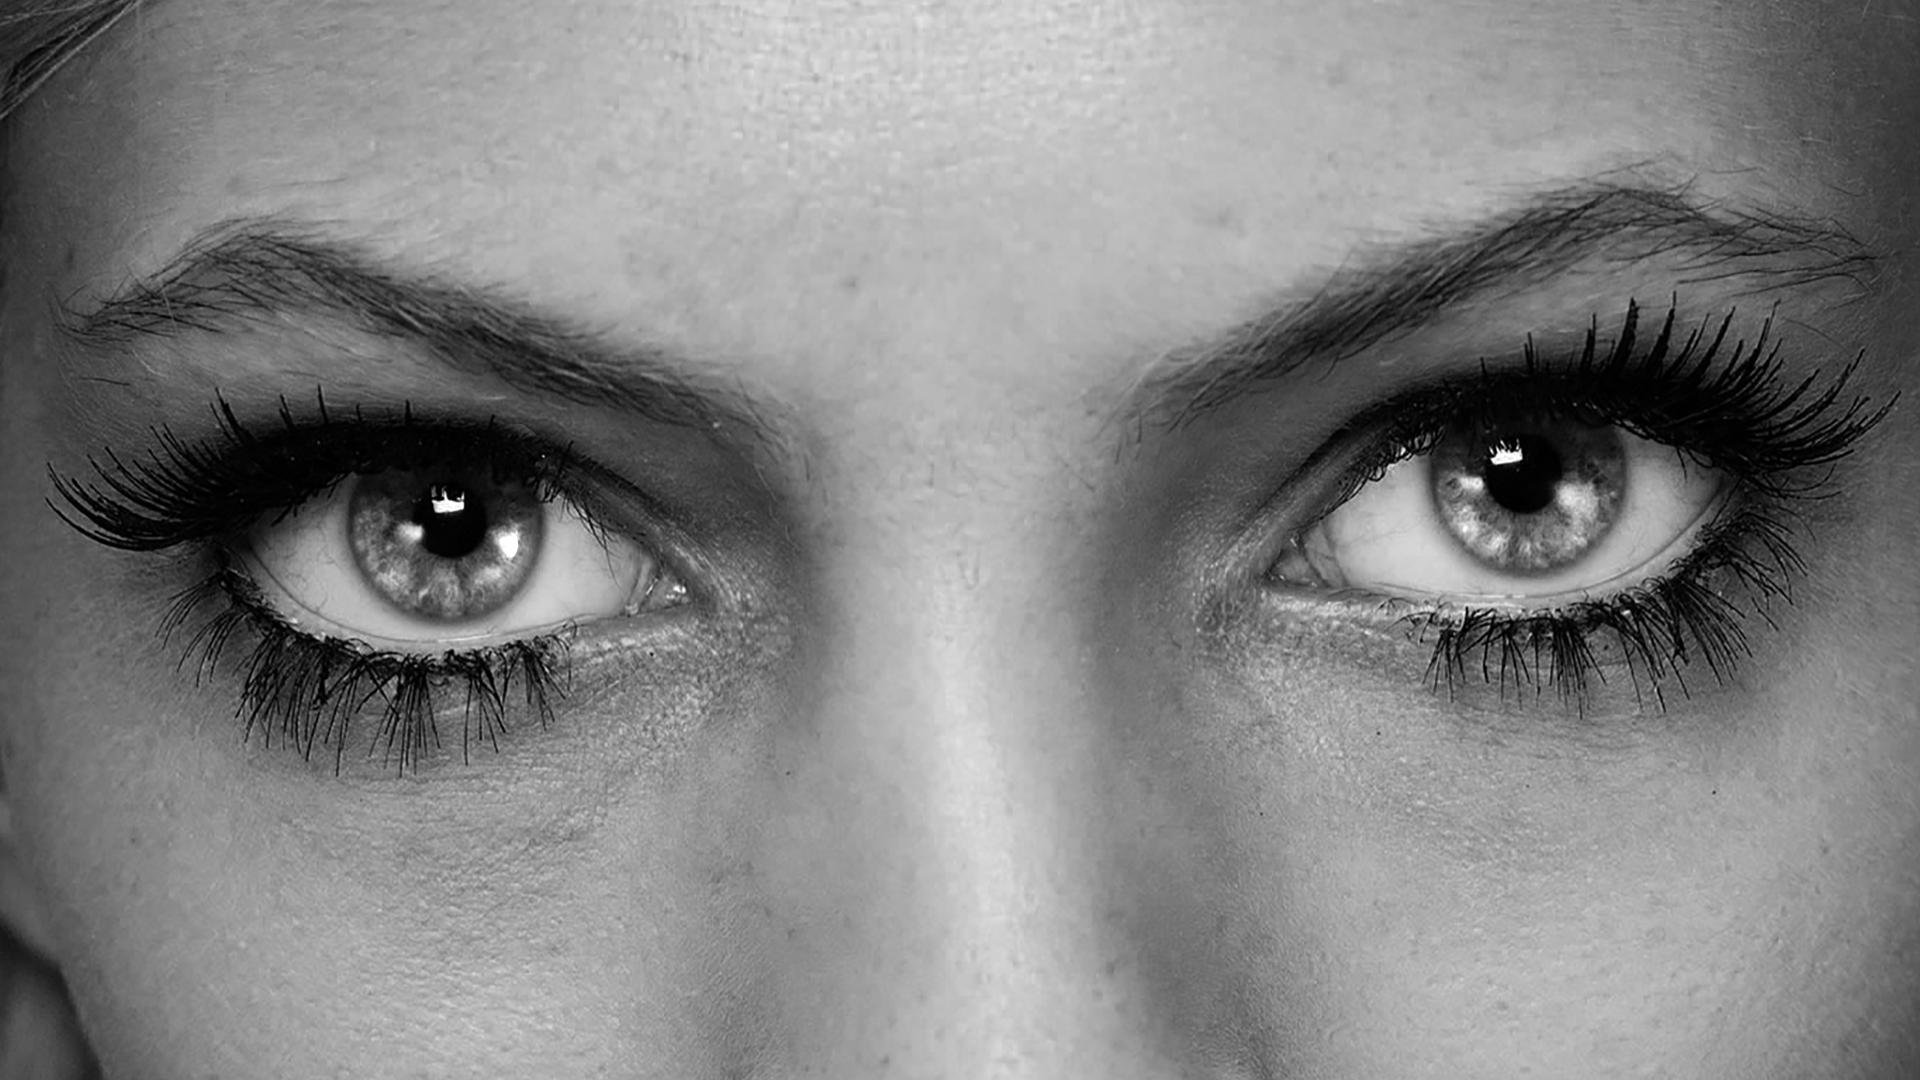 девушки картинки про глаза про взгляд тяжело утрату переживали